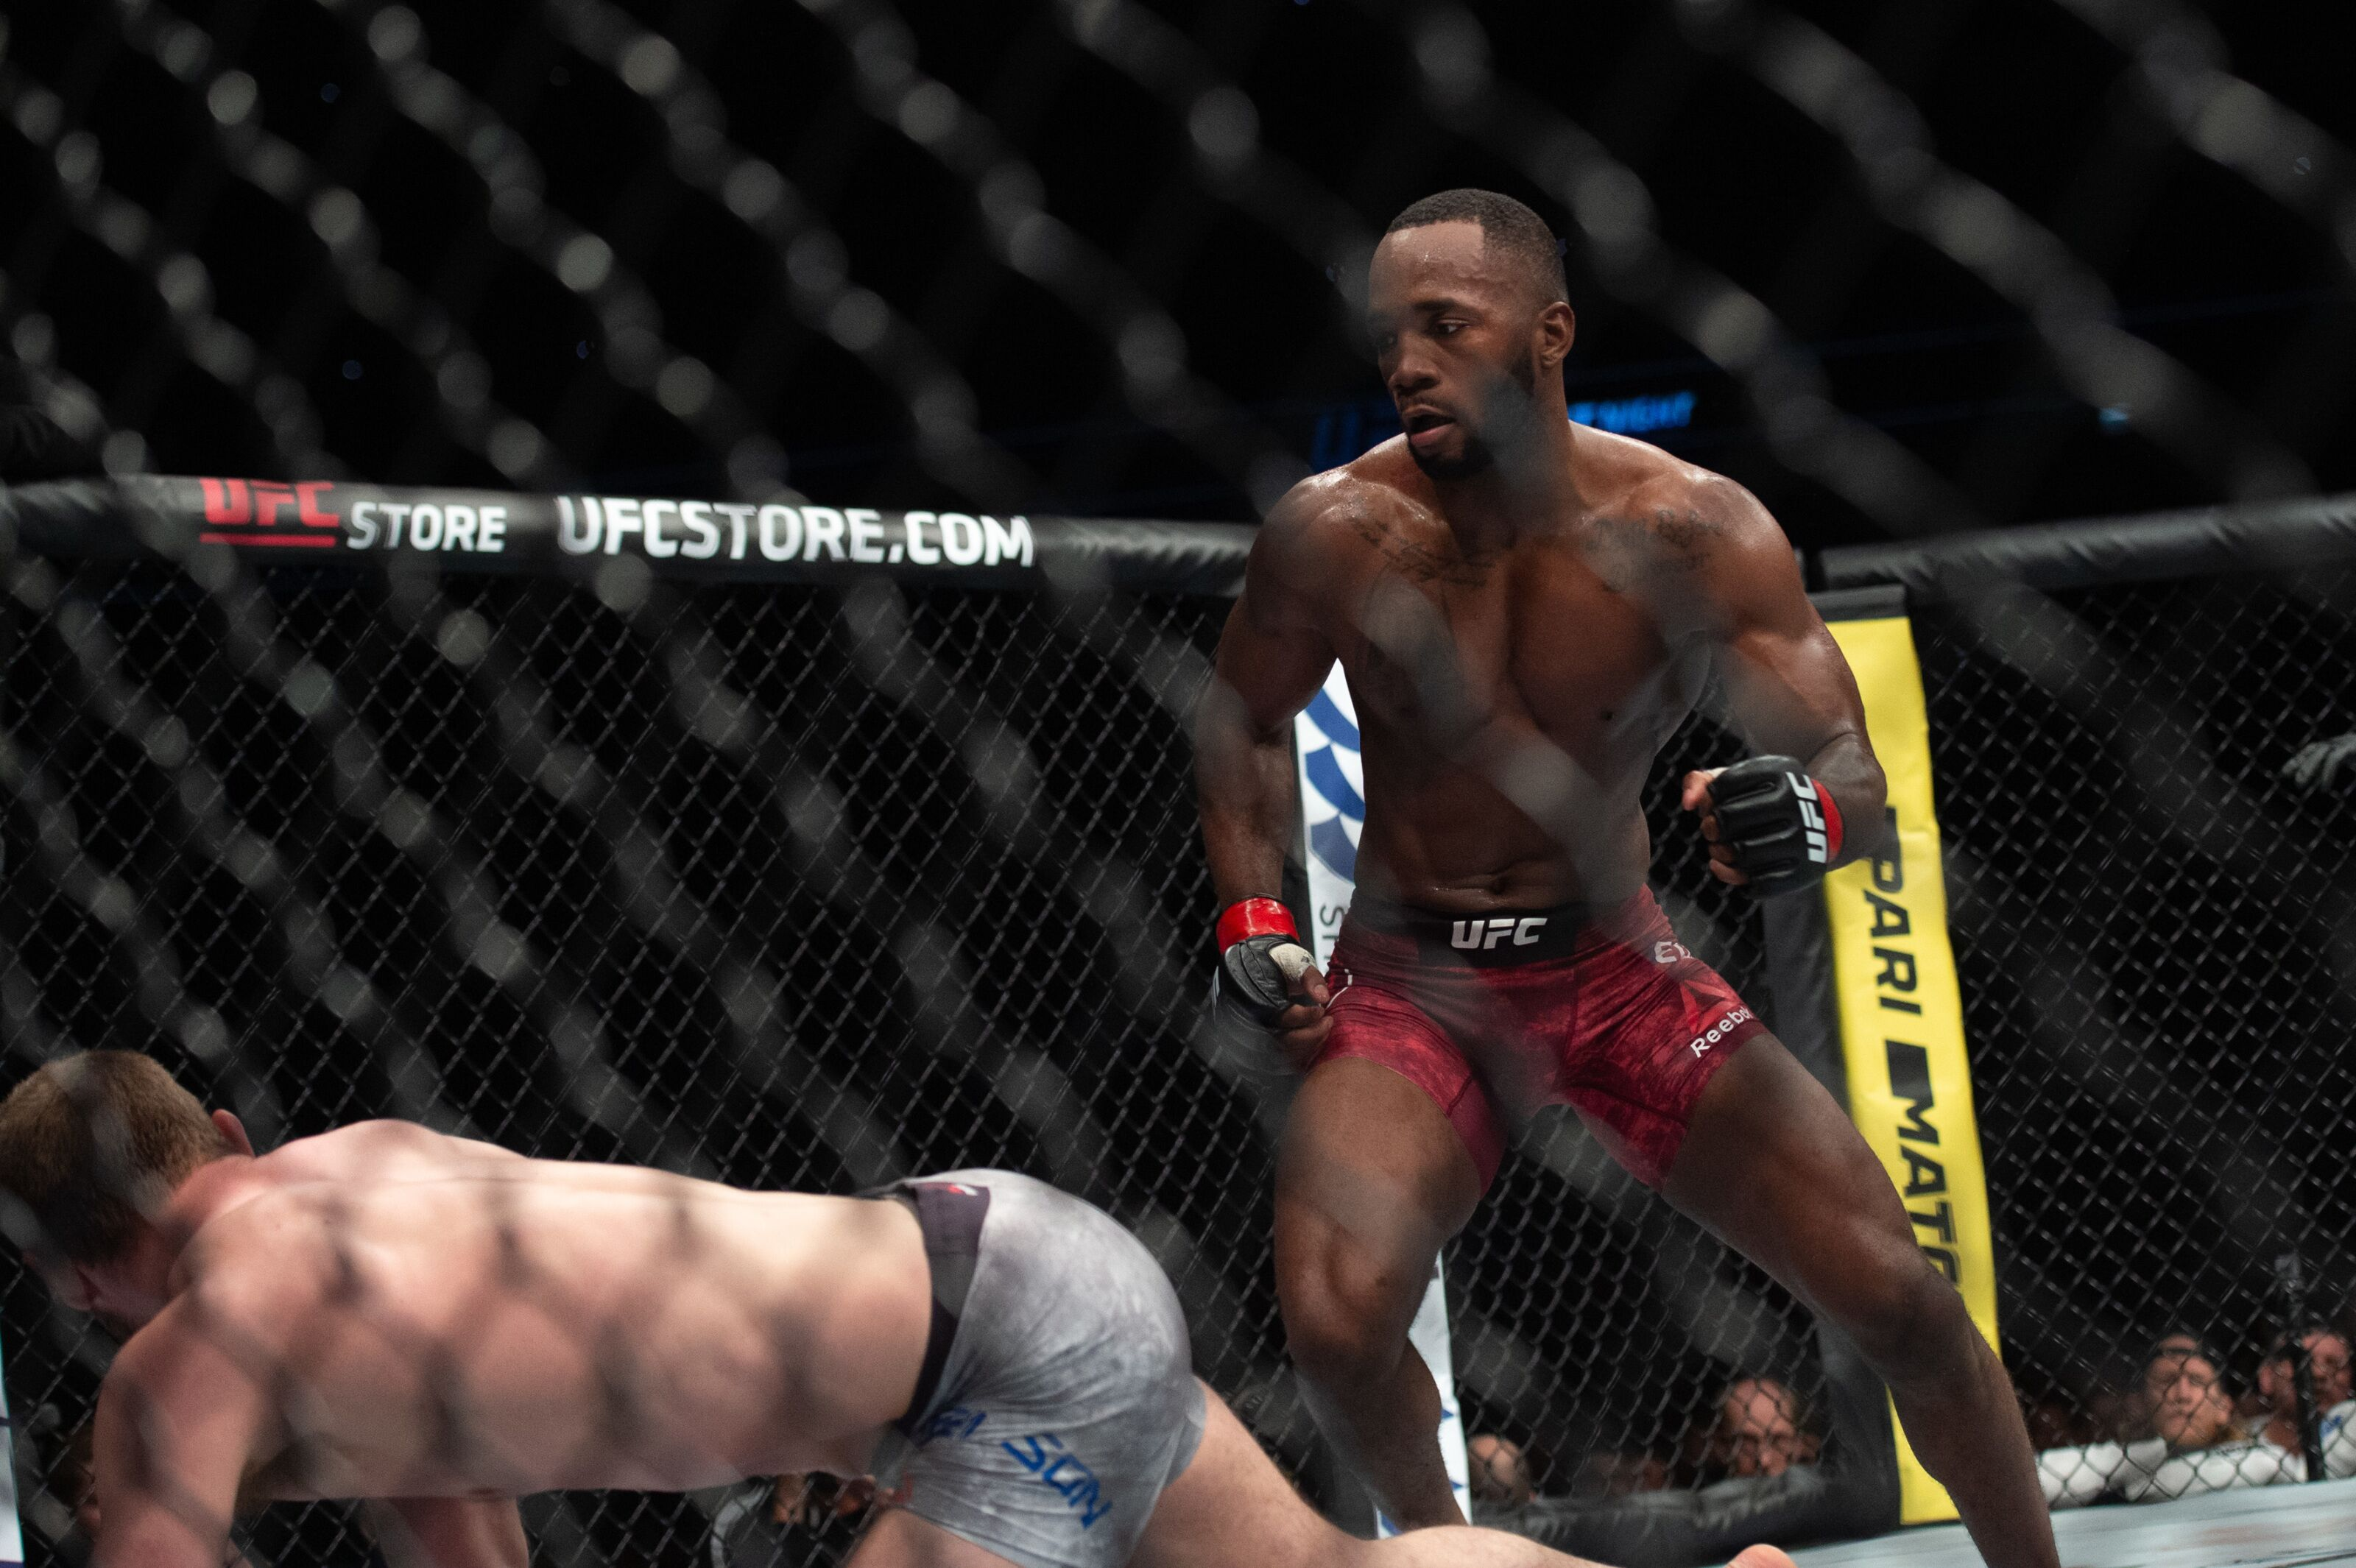 UFC San Antonio: Leon Edwards wants to fight for title, then 'spank' Jorge Masvidal